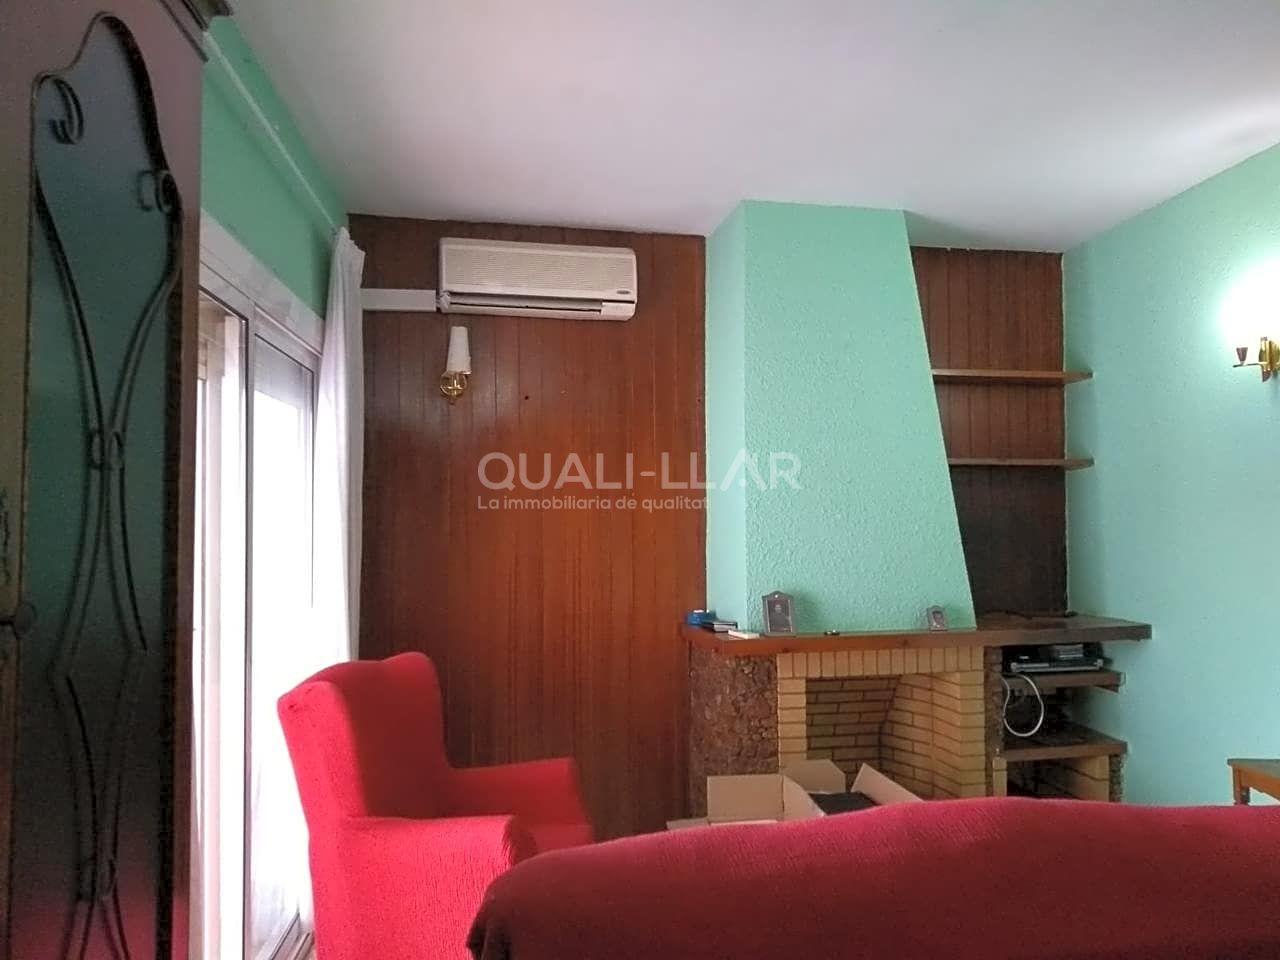 Servicios inmobiliarios en el baix llobregat piso en venta en sant feliu de llobregat de 75 m2 - Casas en venta en sant feliu de llobregat ...